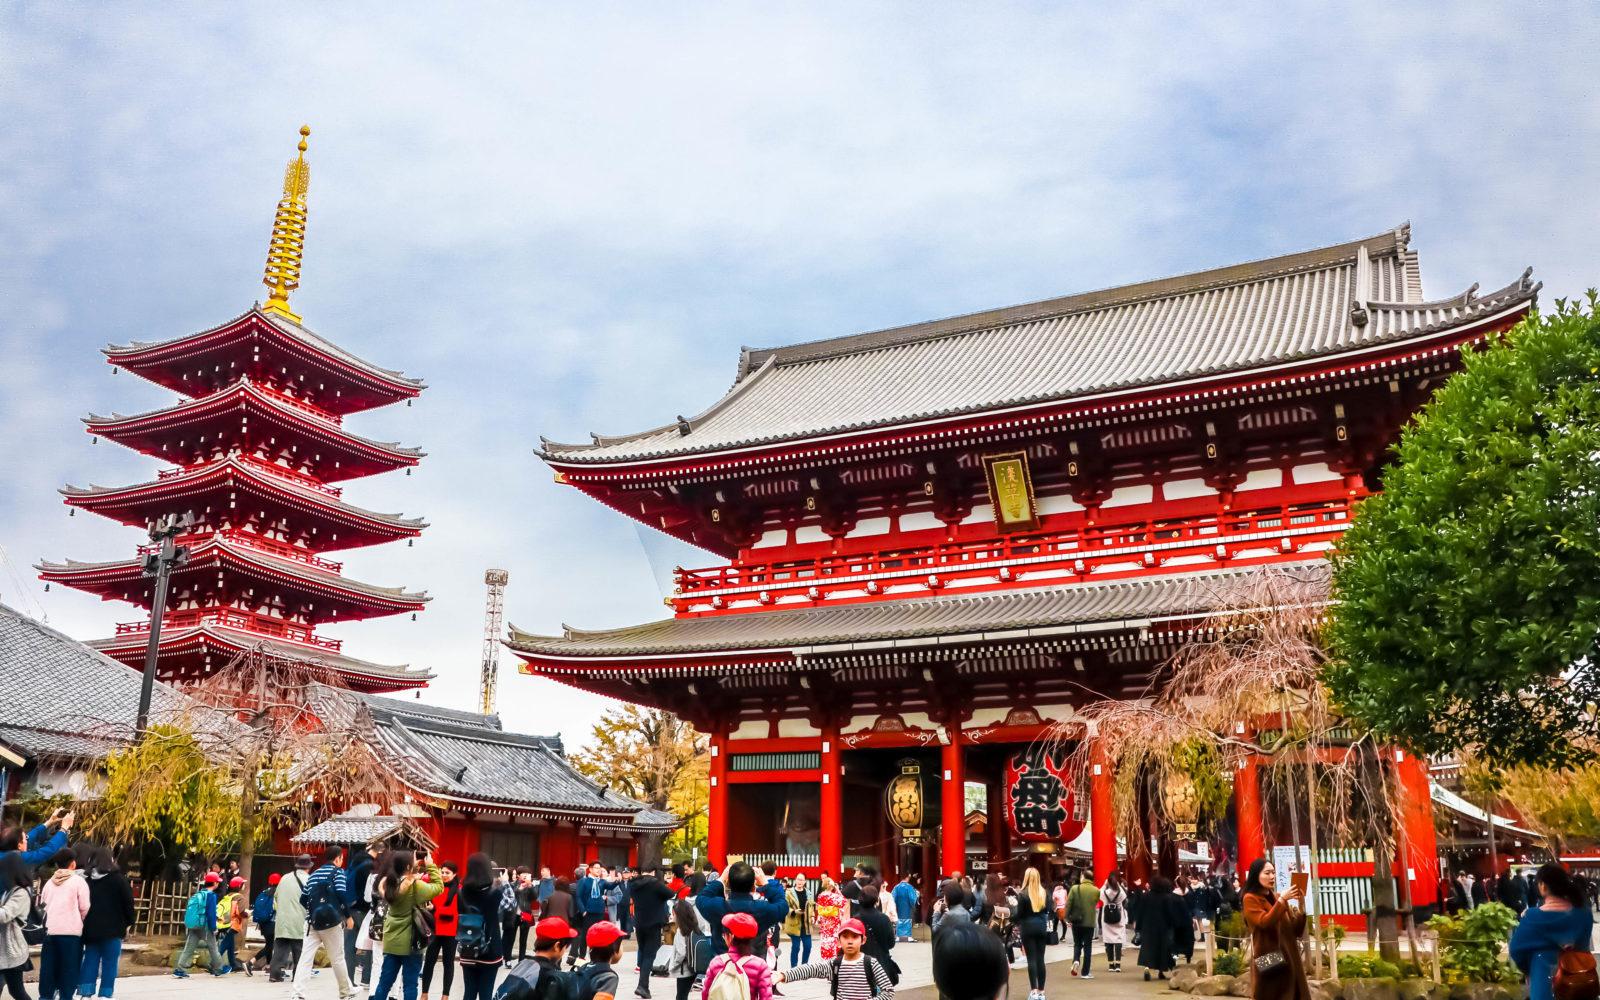 https://www.alexisjetsets.com/wp-content/uploads/2019/01/tokyo-sensoji-temple-alexisjetsets-e1547465076859.jpg